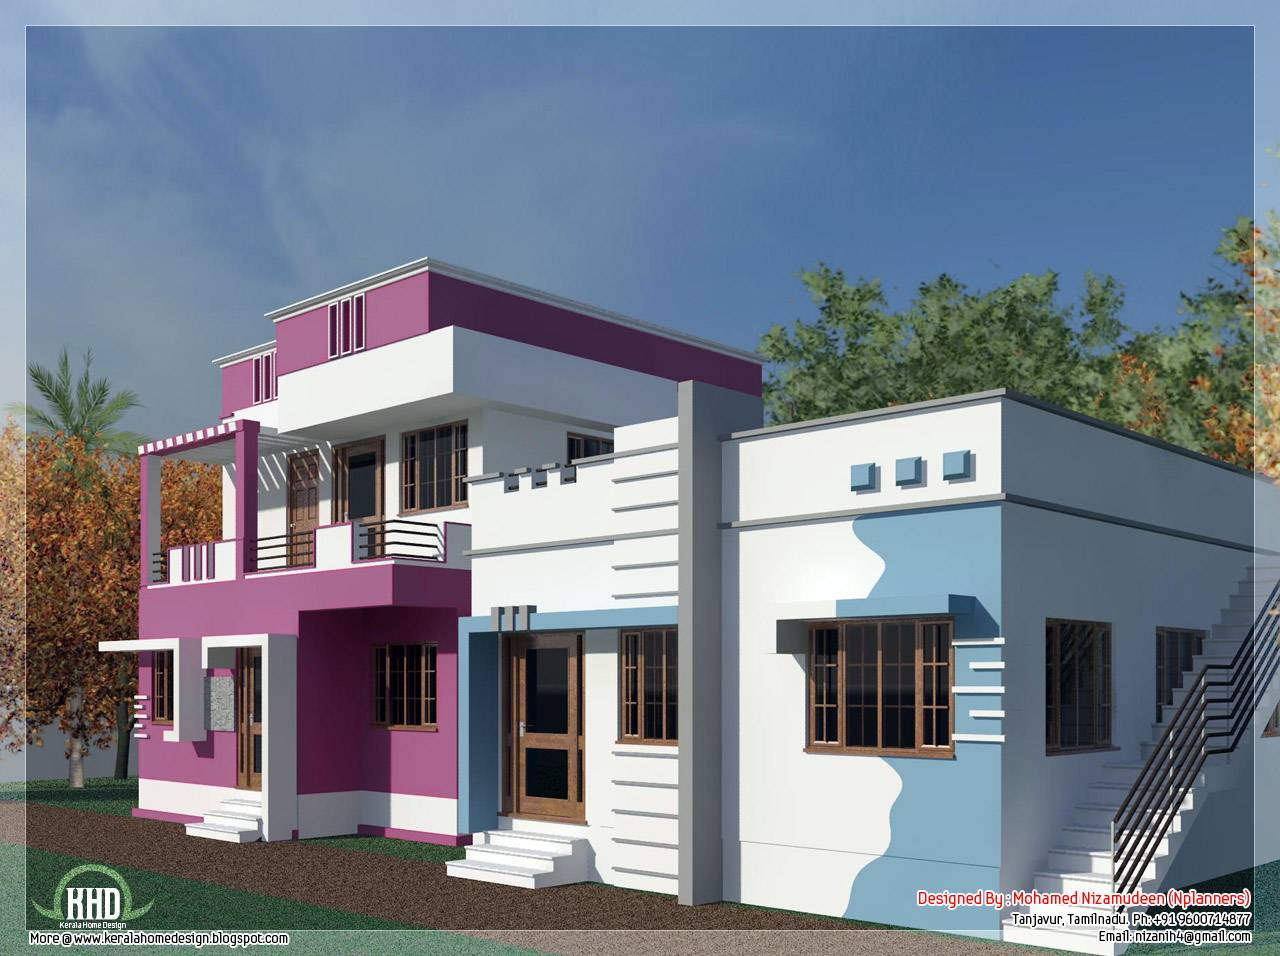 Lladro model house camella